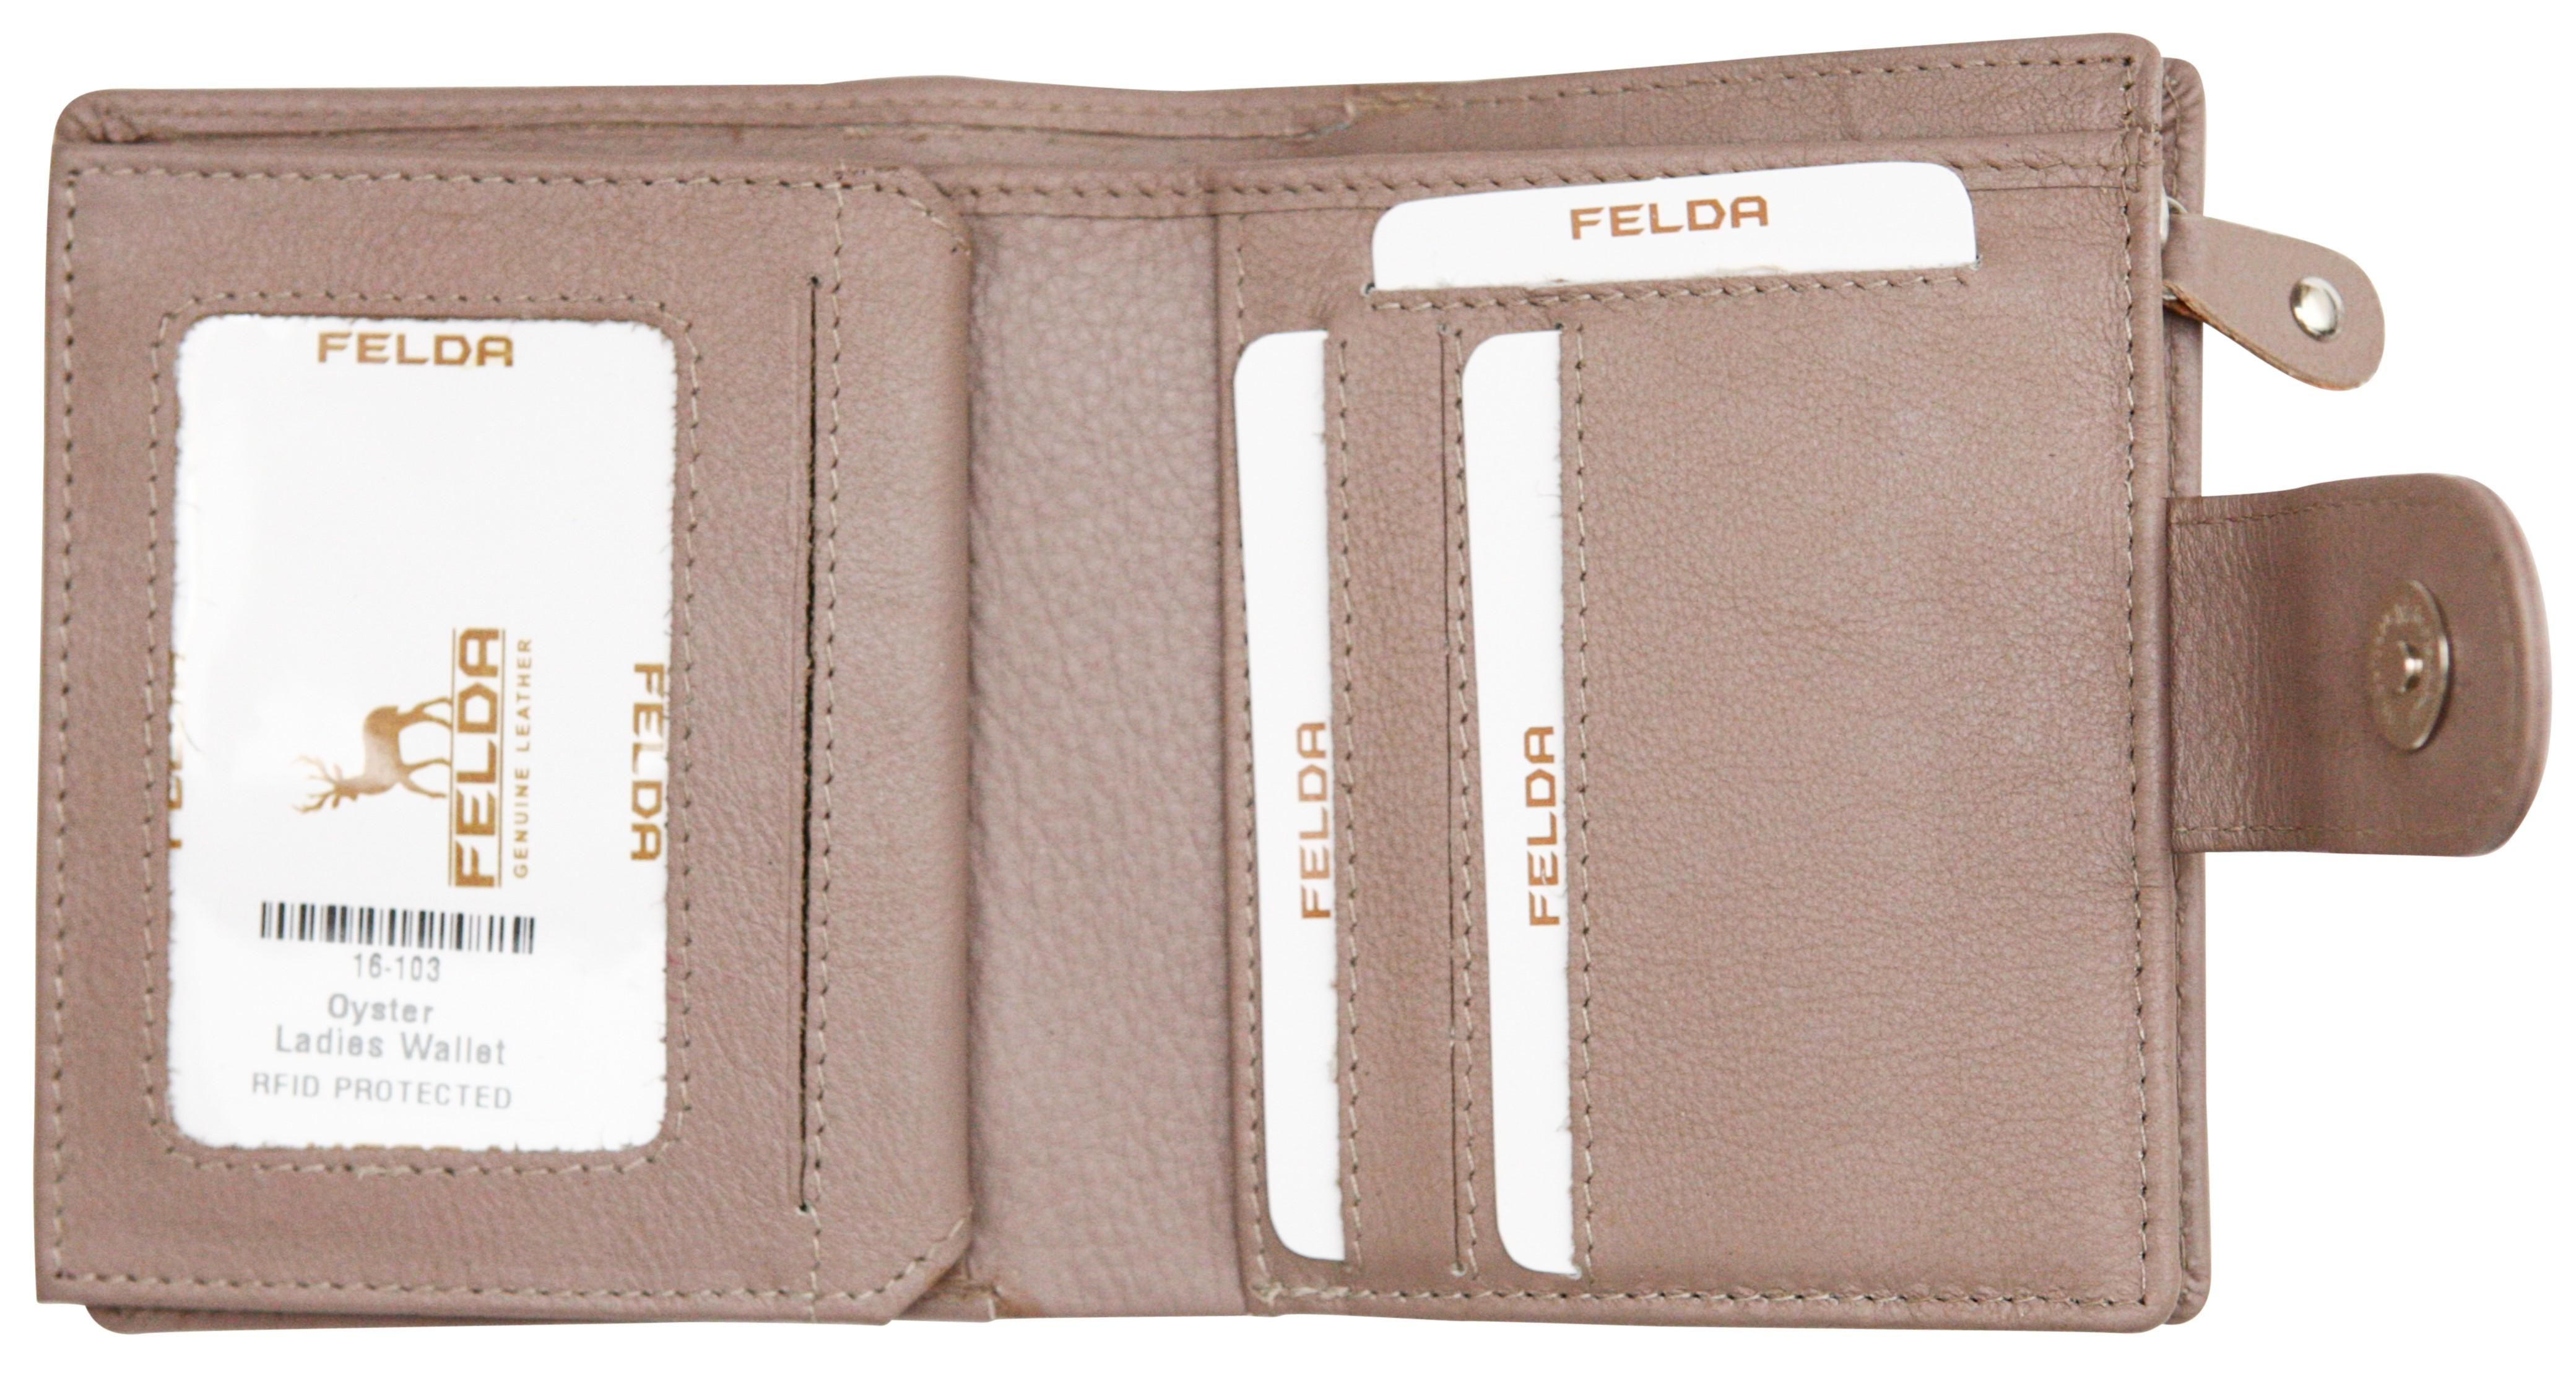 Felda-RFID-onorevoli-MEDAGLIA-amp-Card-Purse-Wallet-Genuine-Leather-Multi-SOFT-BOX-REGALO miniatura 77